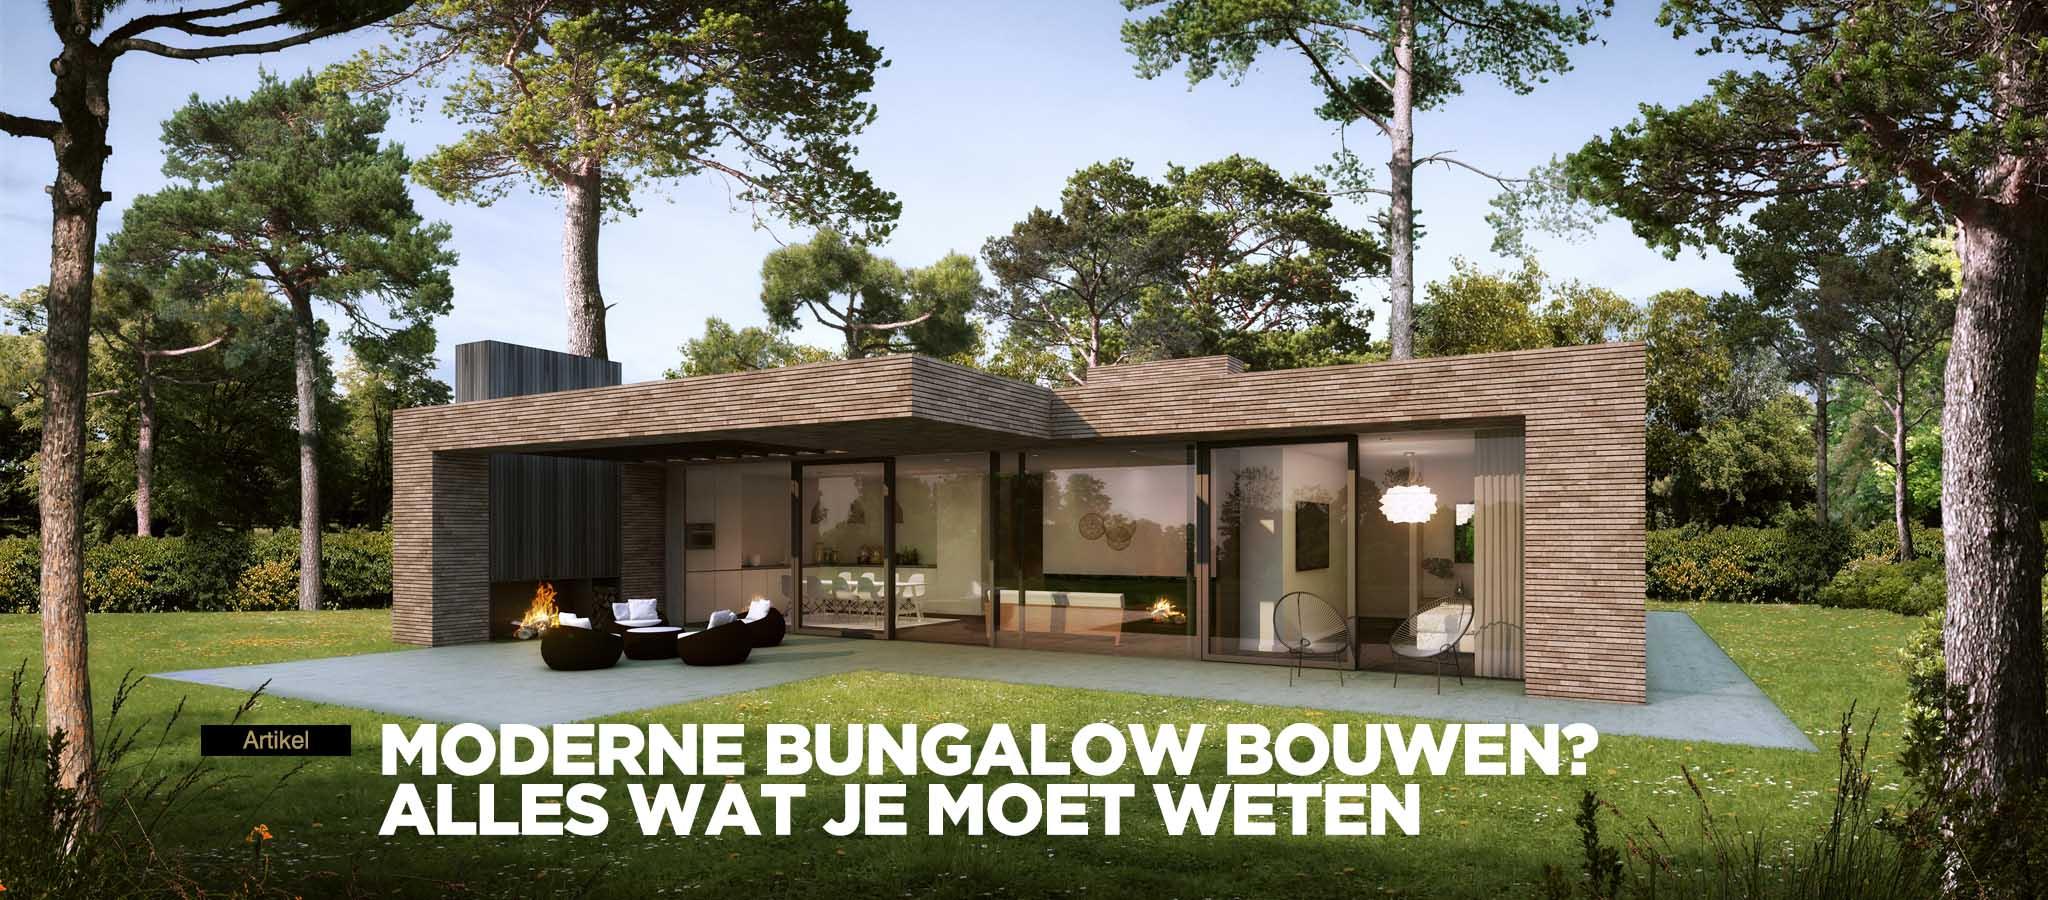 erne-bungalow-bouwen_bungalow